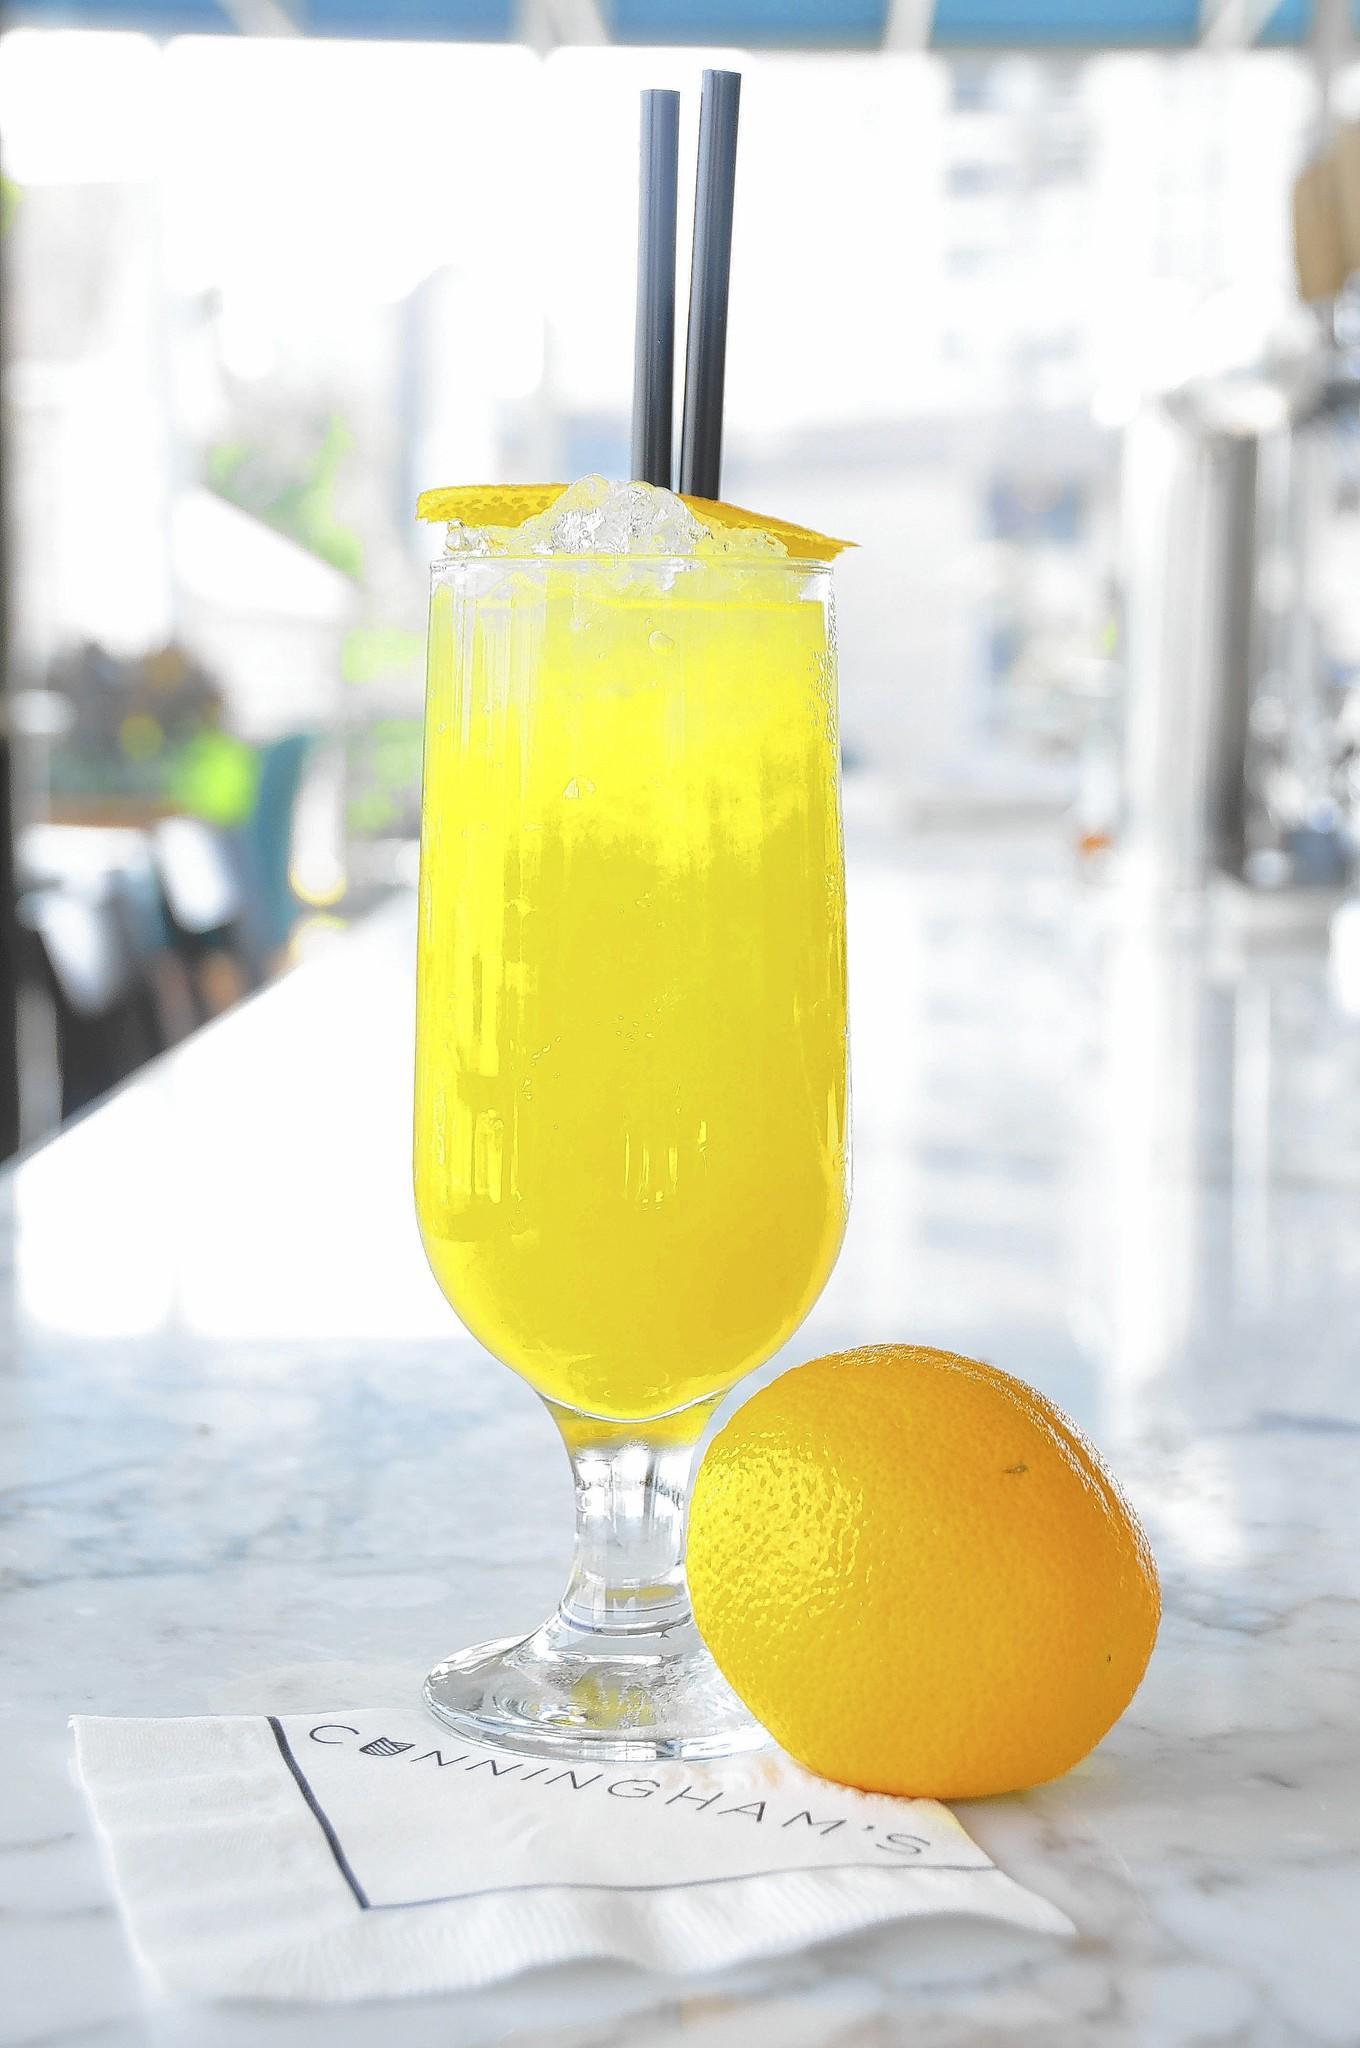 Get your Vitamin C at Cunningham's.